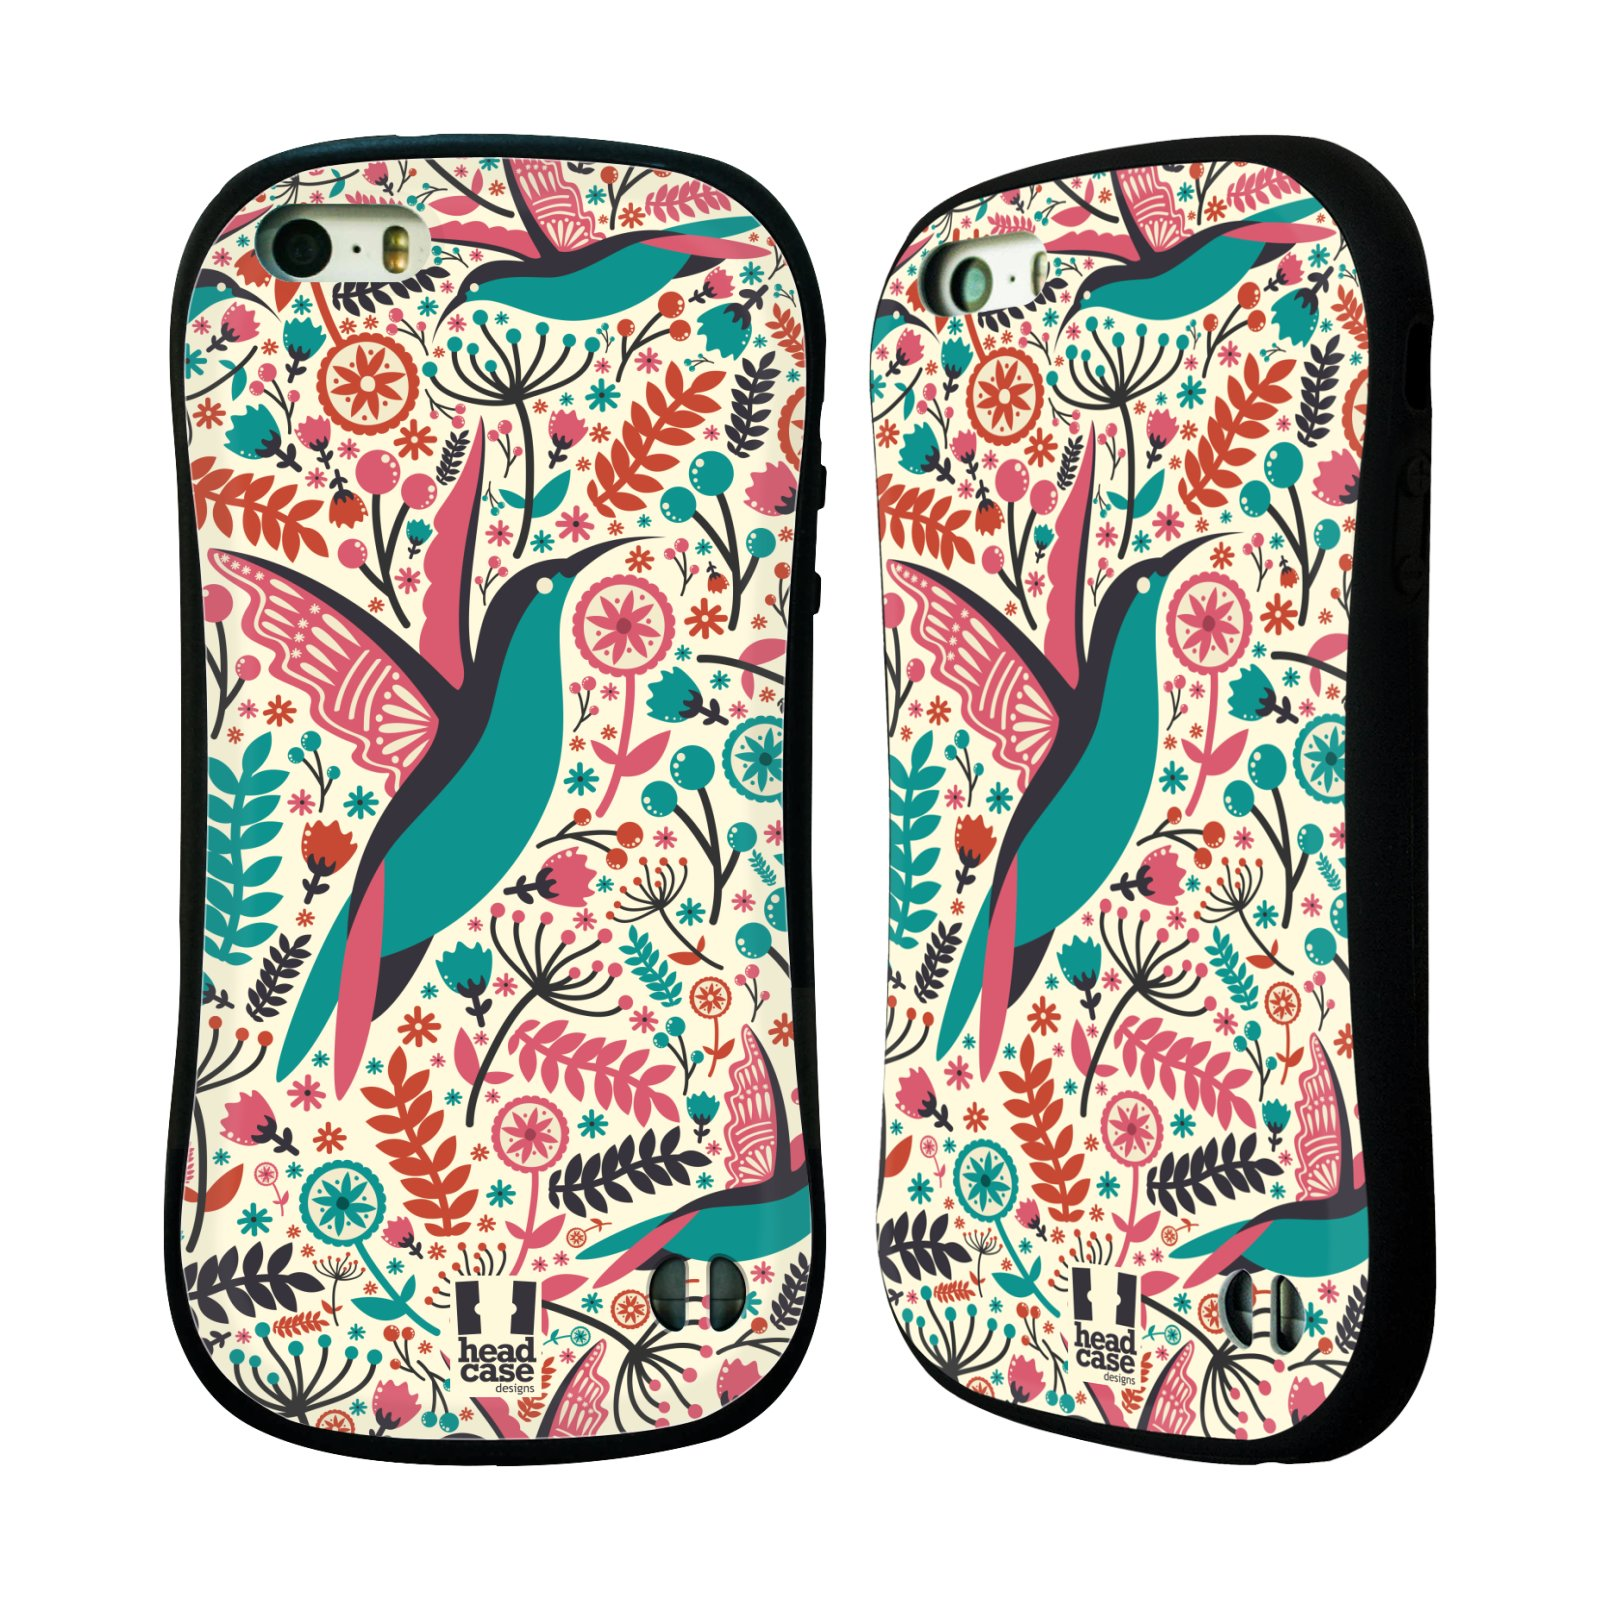 HEAD CASE silikon/plast odolný obal na mobil Apple Iphone 5/5S vzor kreslení ptáci kolibřík